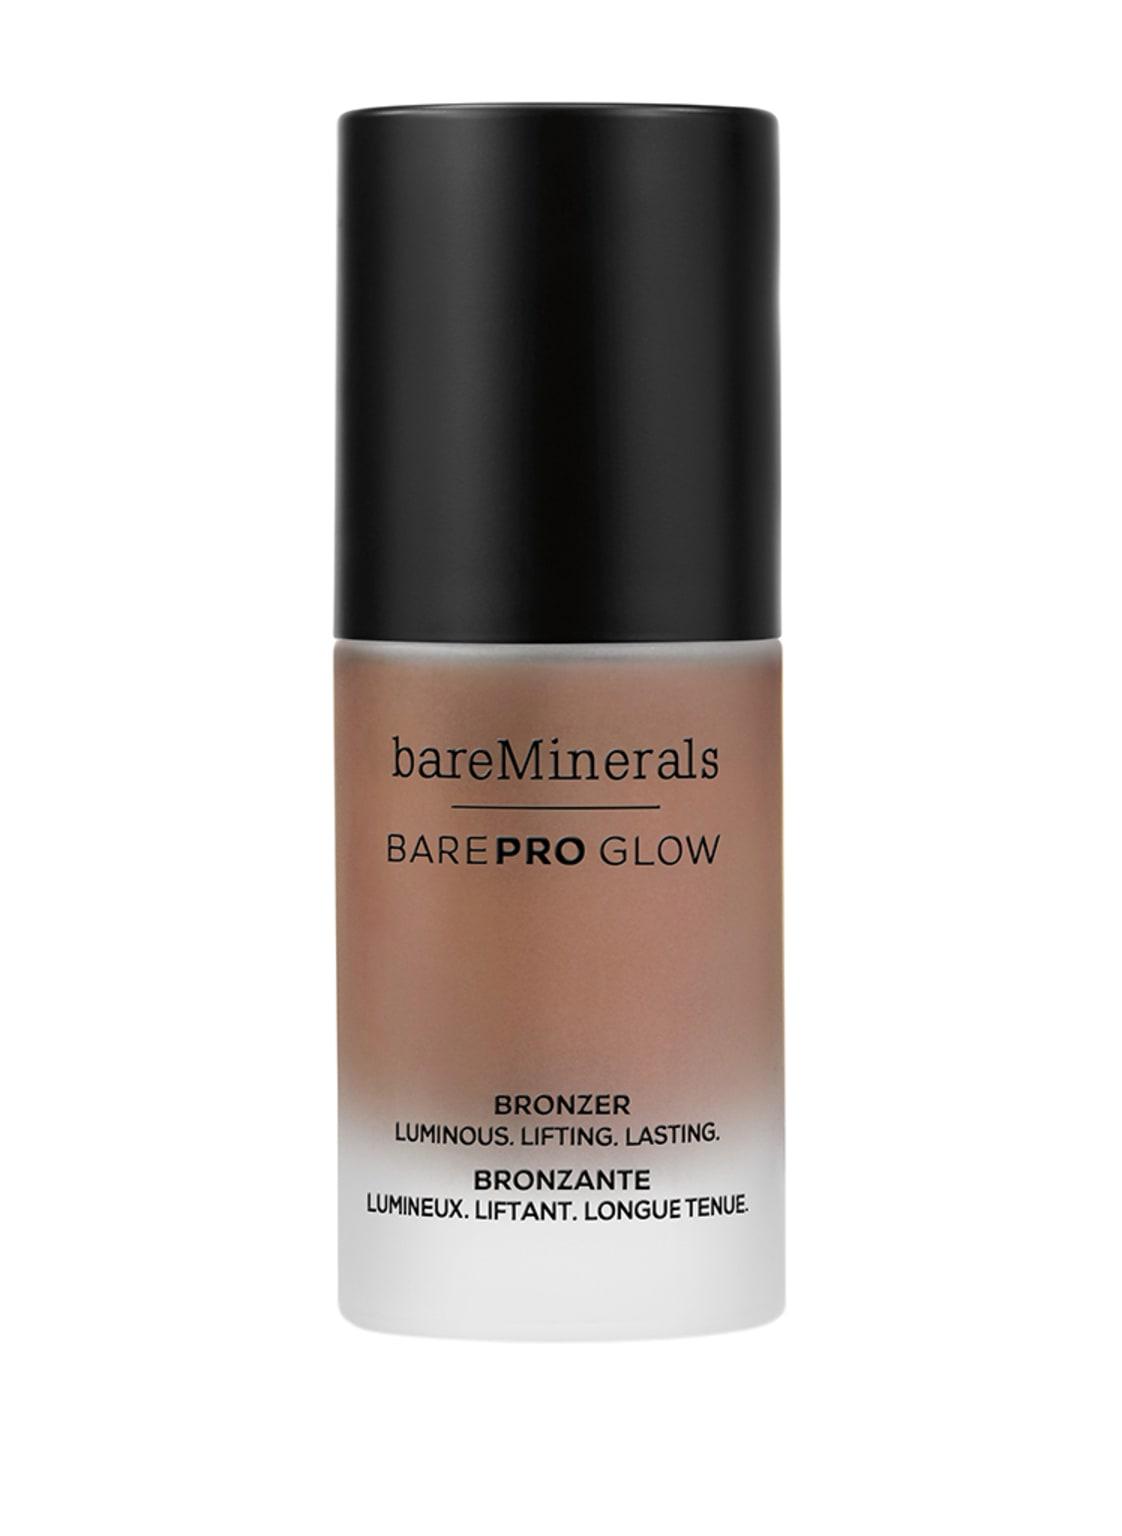 Image of Bareminerals Barepro Glow Bronzer Bronzer